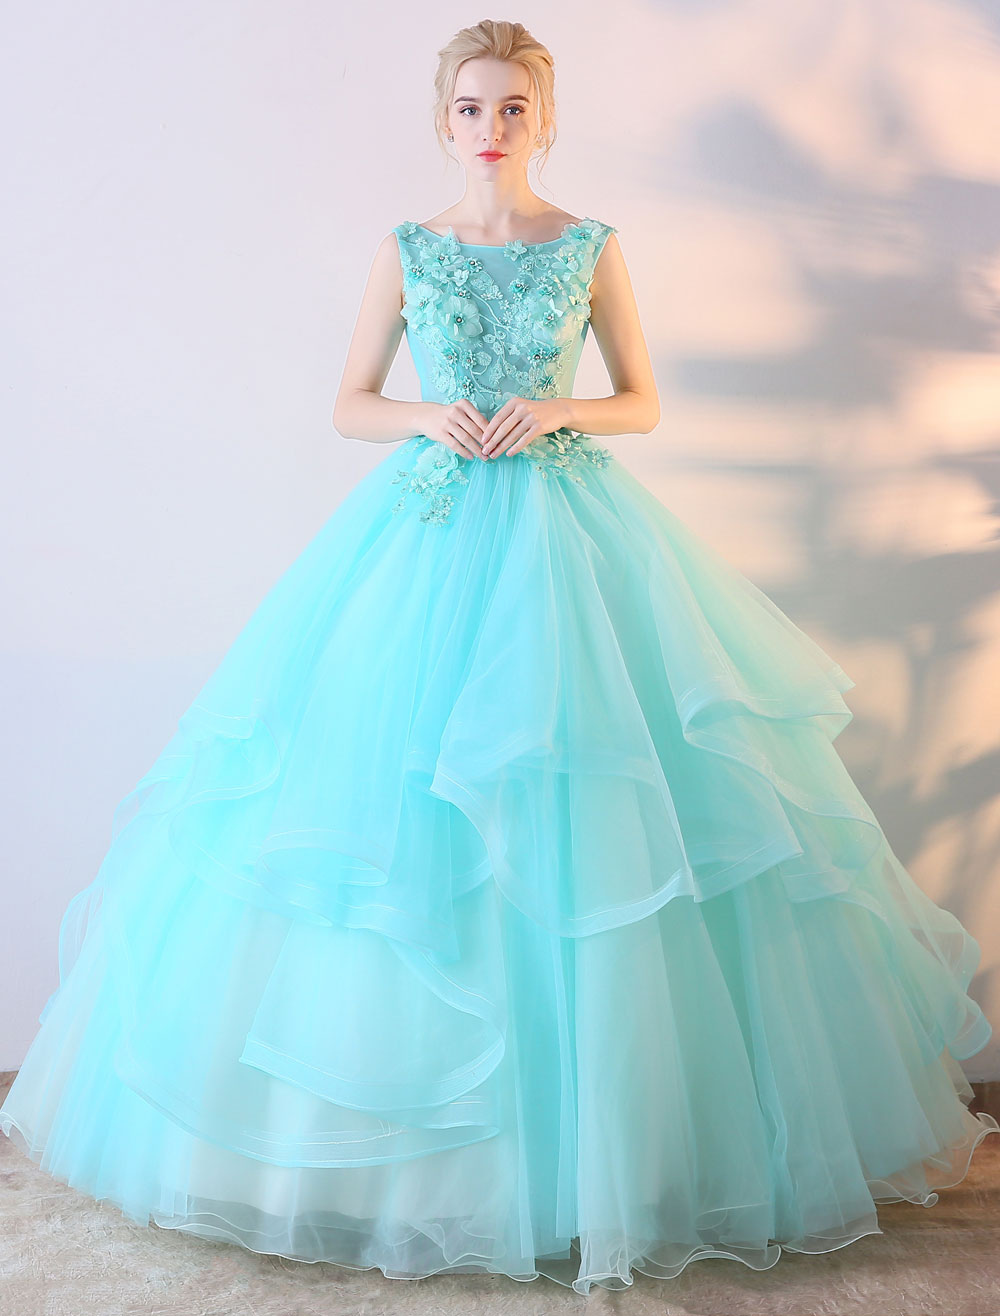 Mint Green Prom Dress Ball Gown Flowers Applique Colored Wedding Dress Floor Length Quinceanera Dress